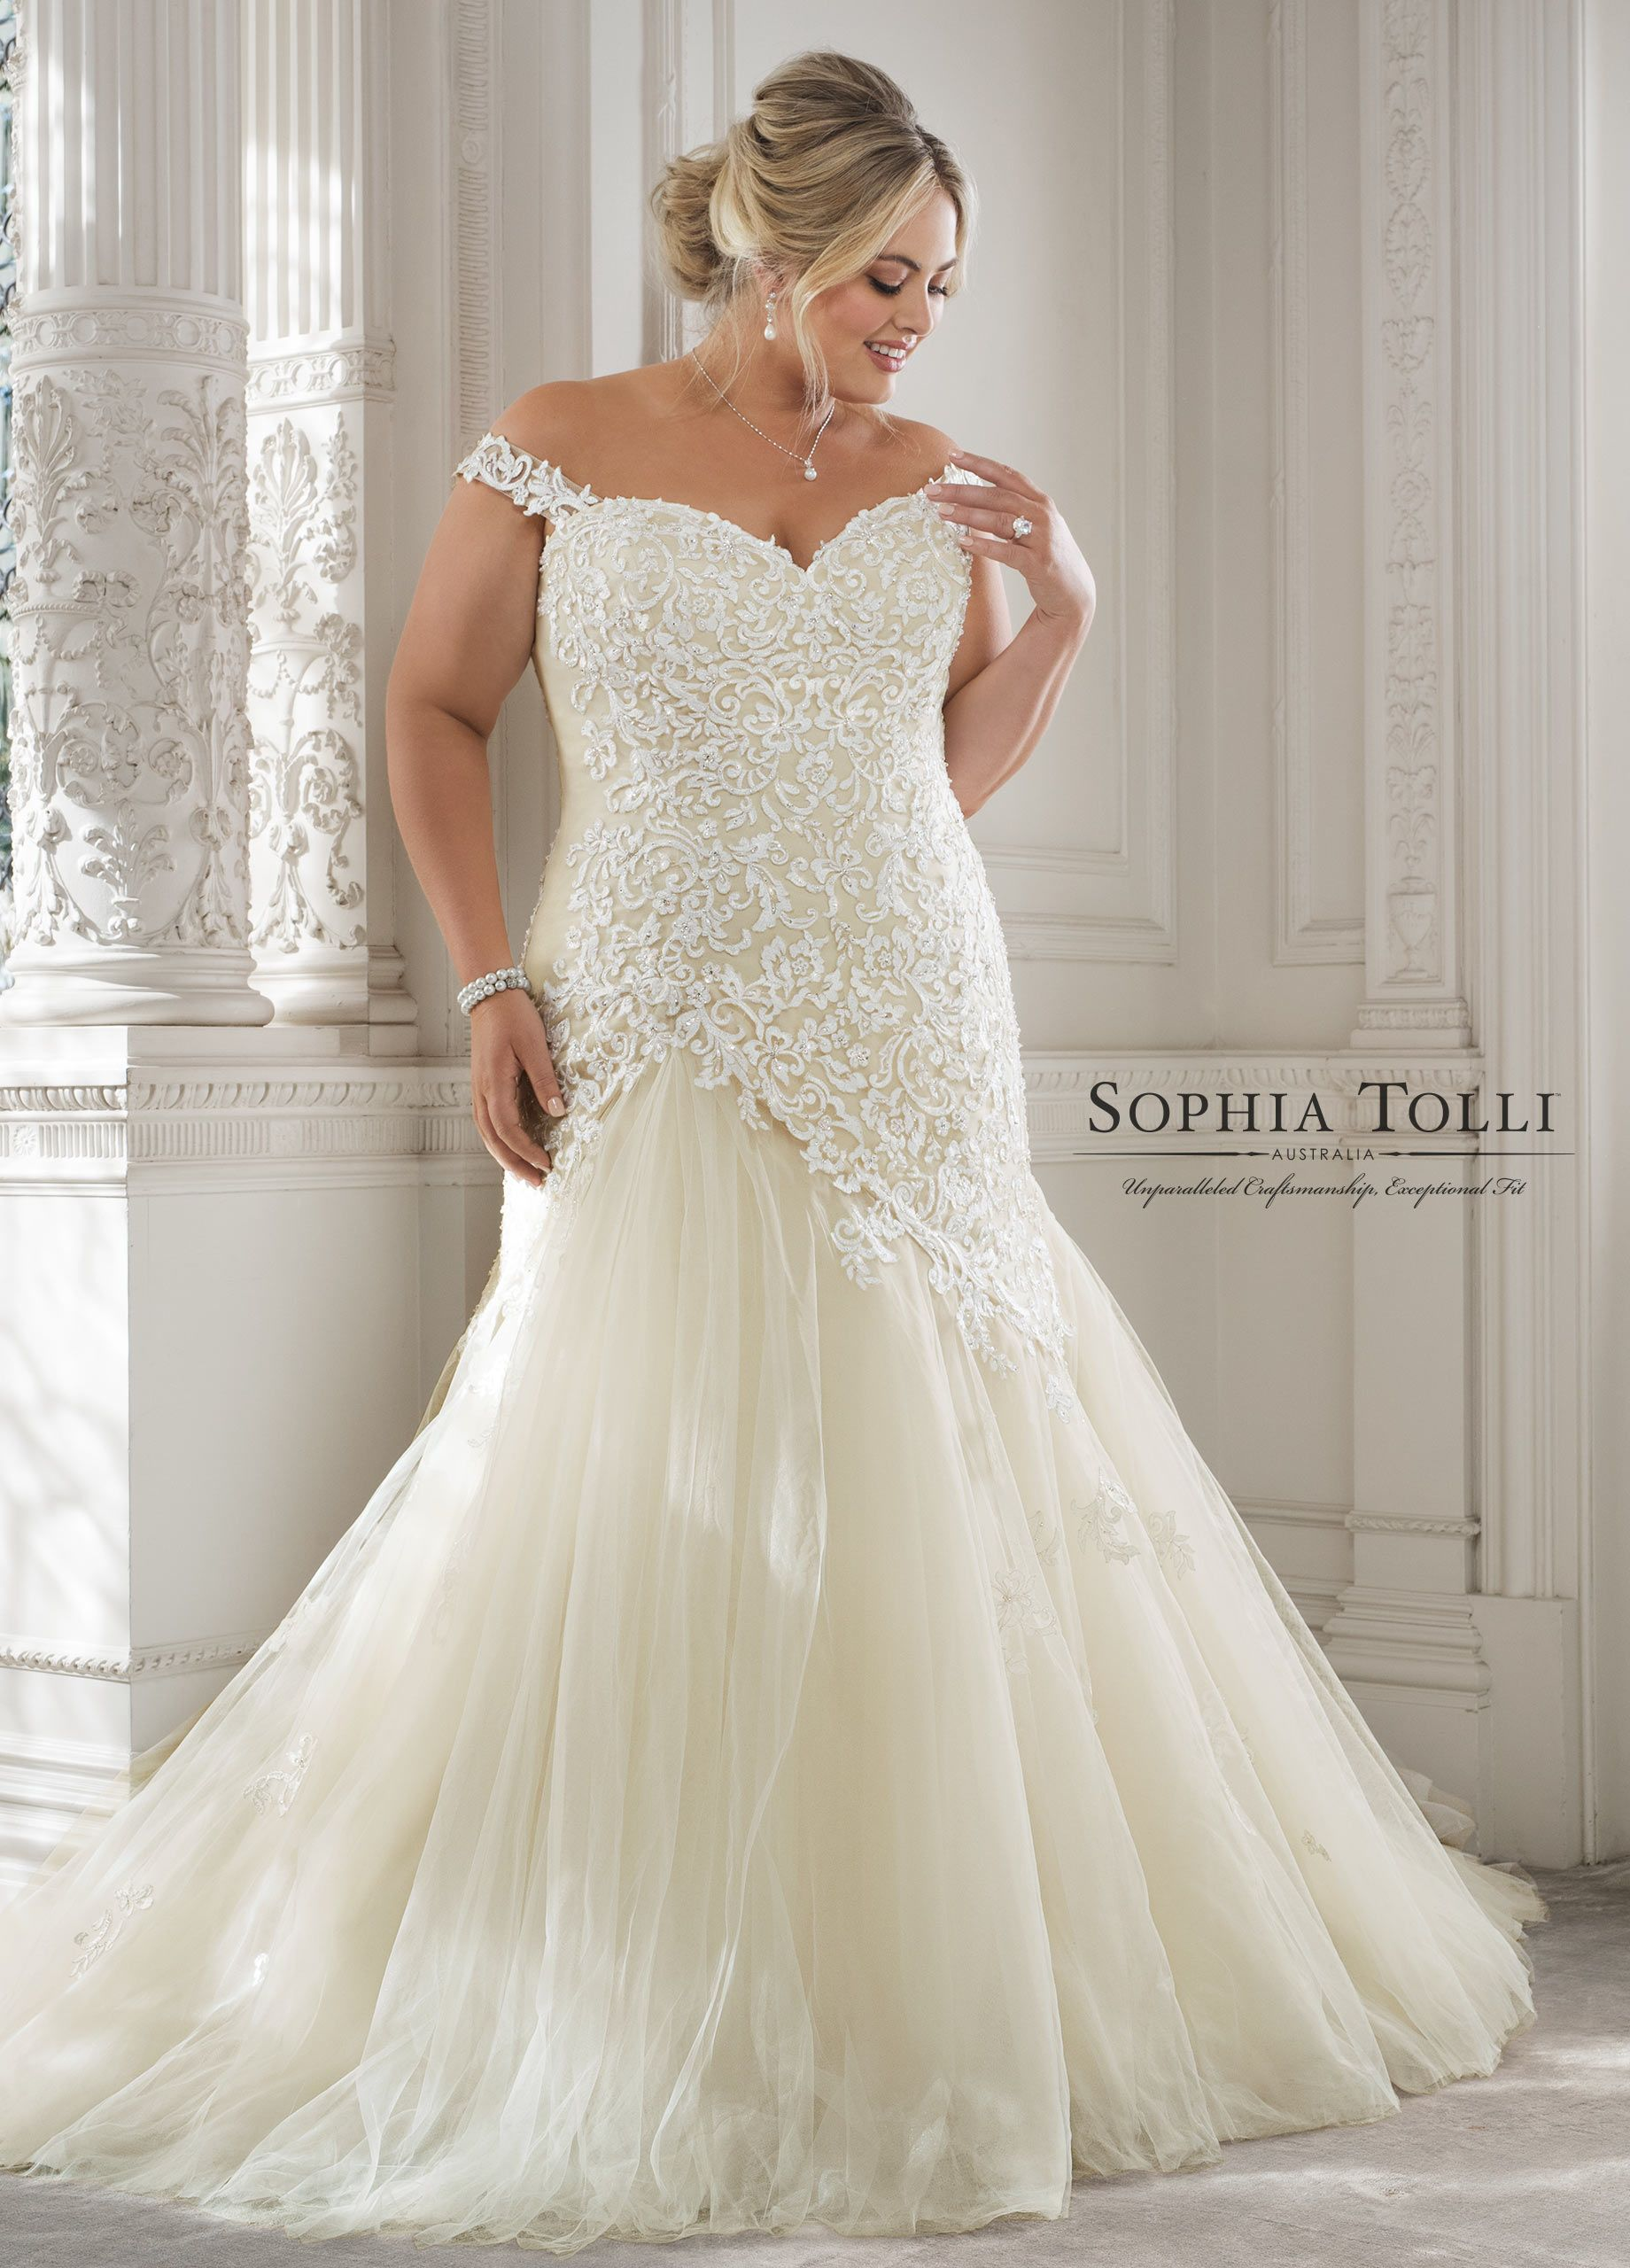 22+ Sophia tolli wedding dresses plus size ideas